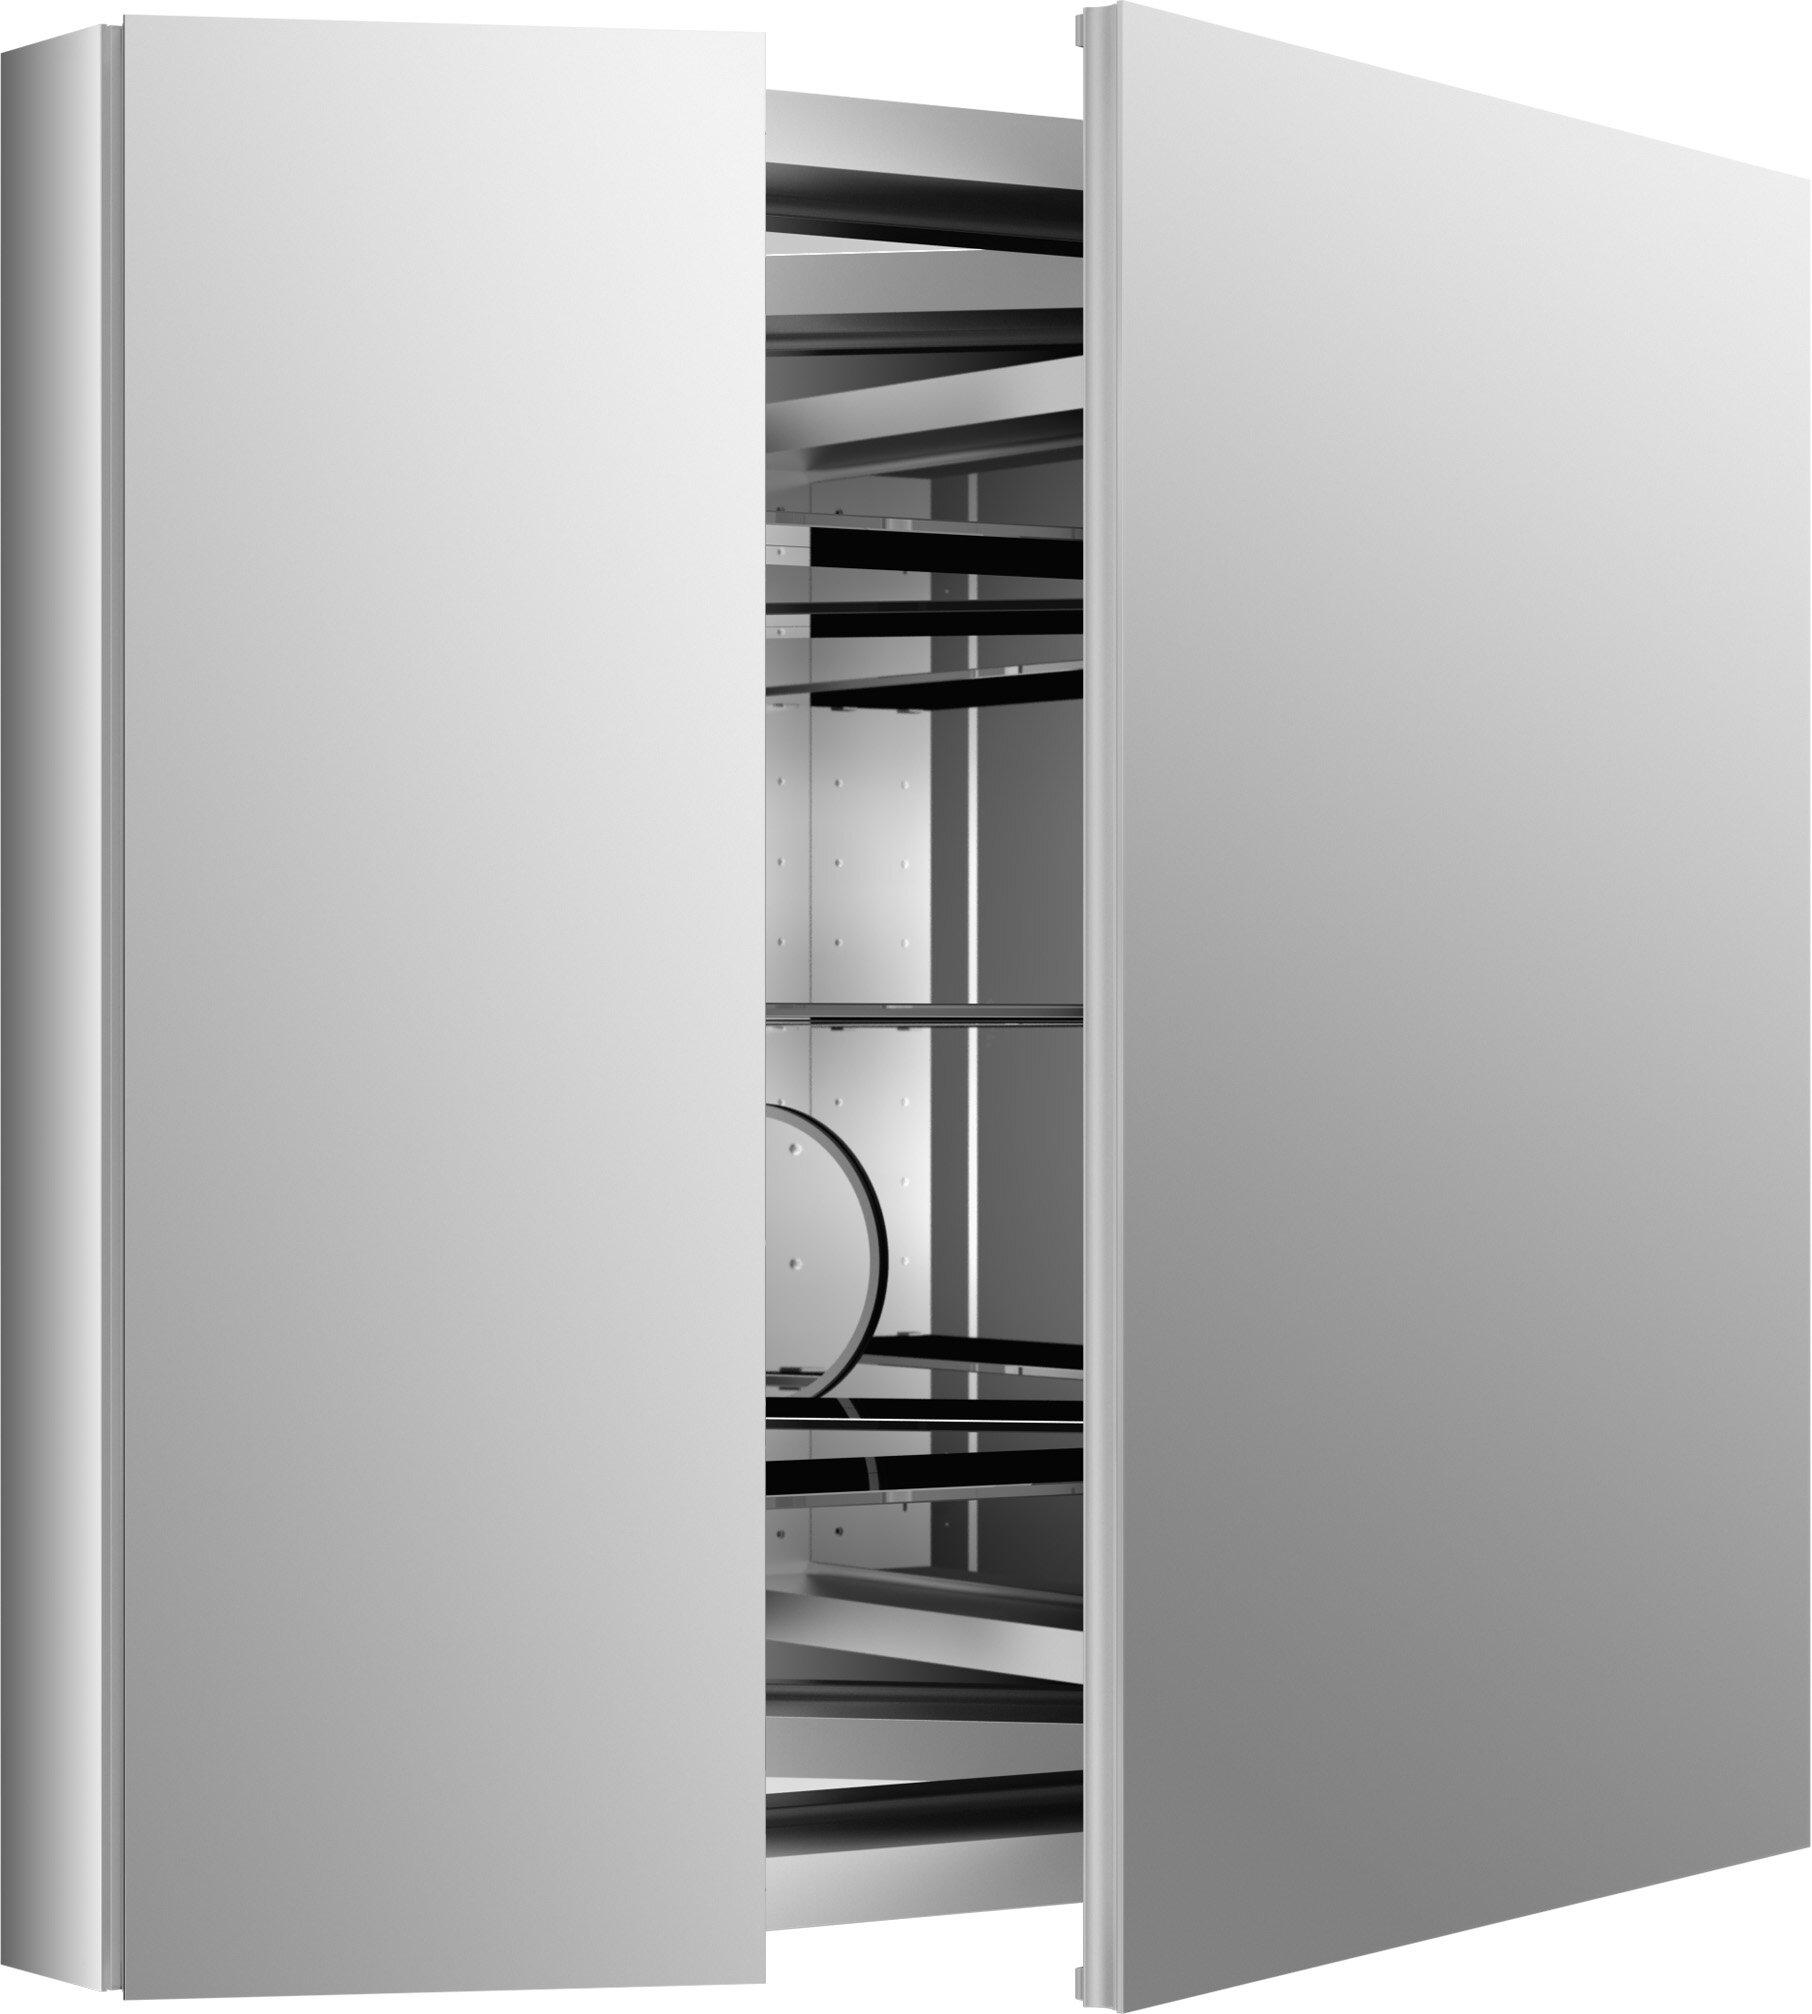 Kohler Verdera Lighted Medicine Cabinet 34 X 30 With Lighting Reviews Wayfair